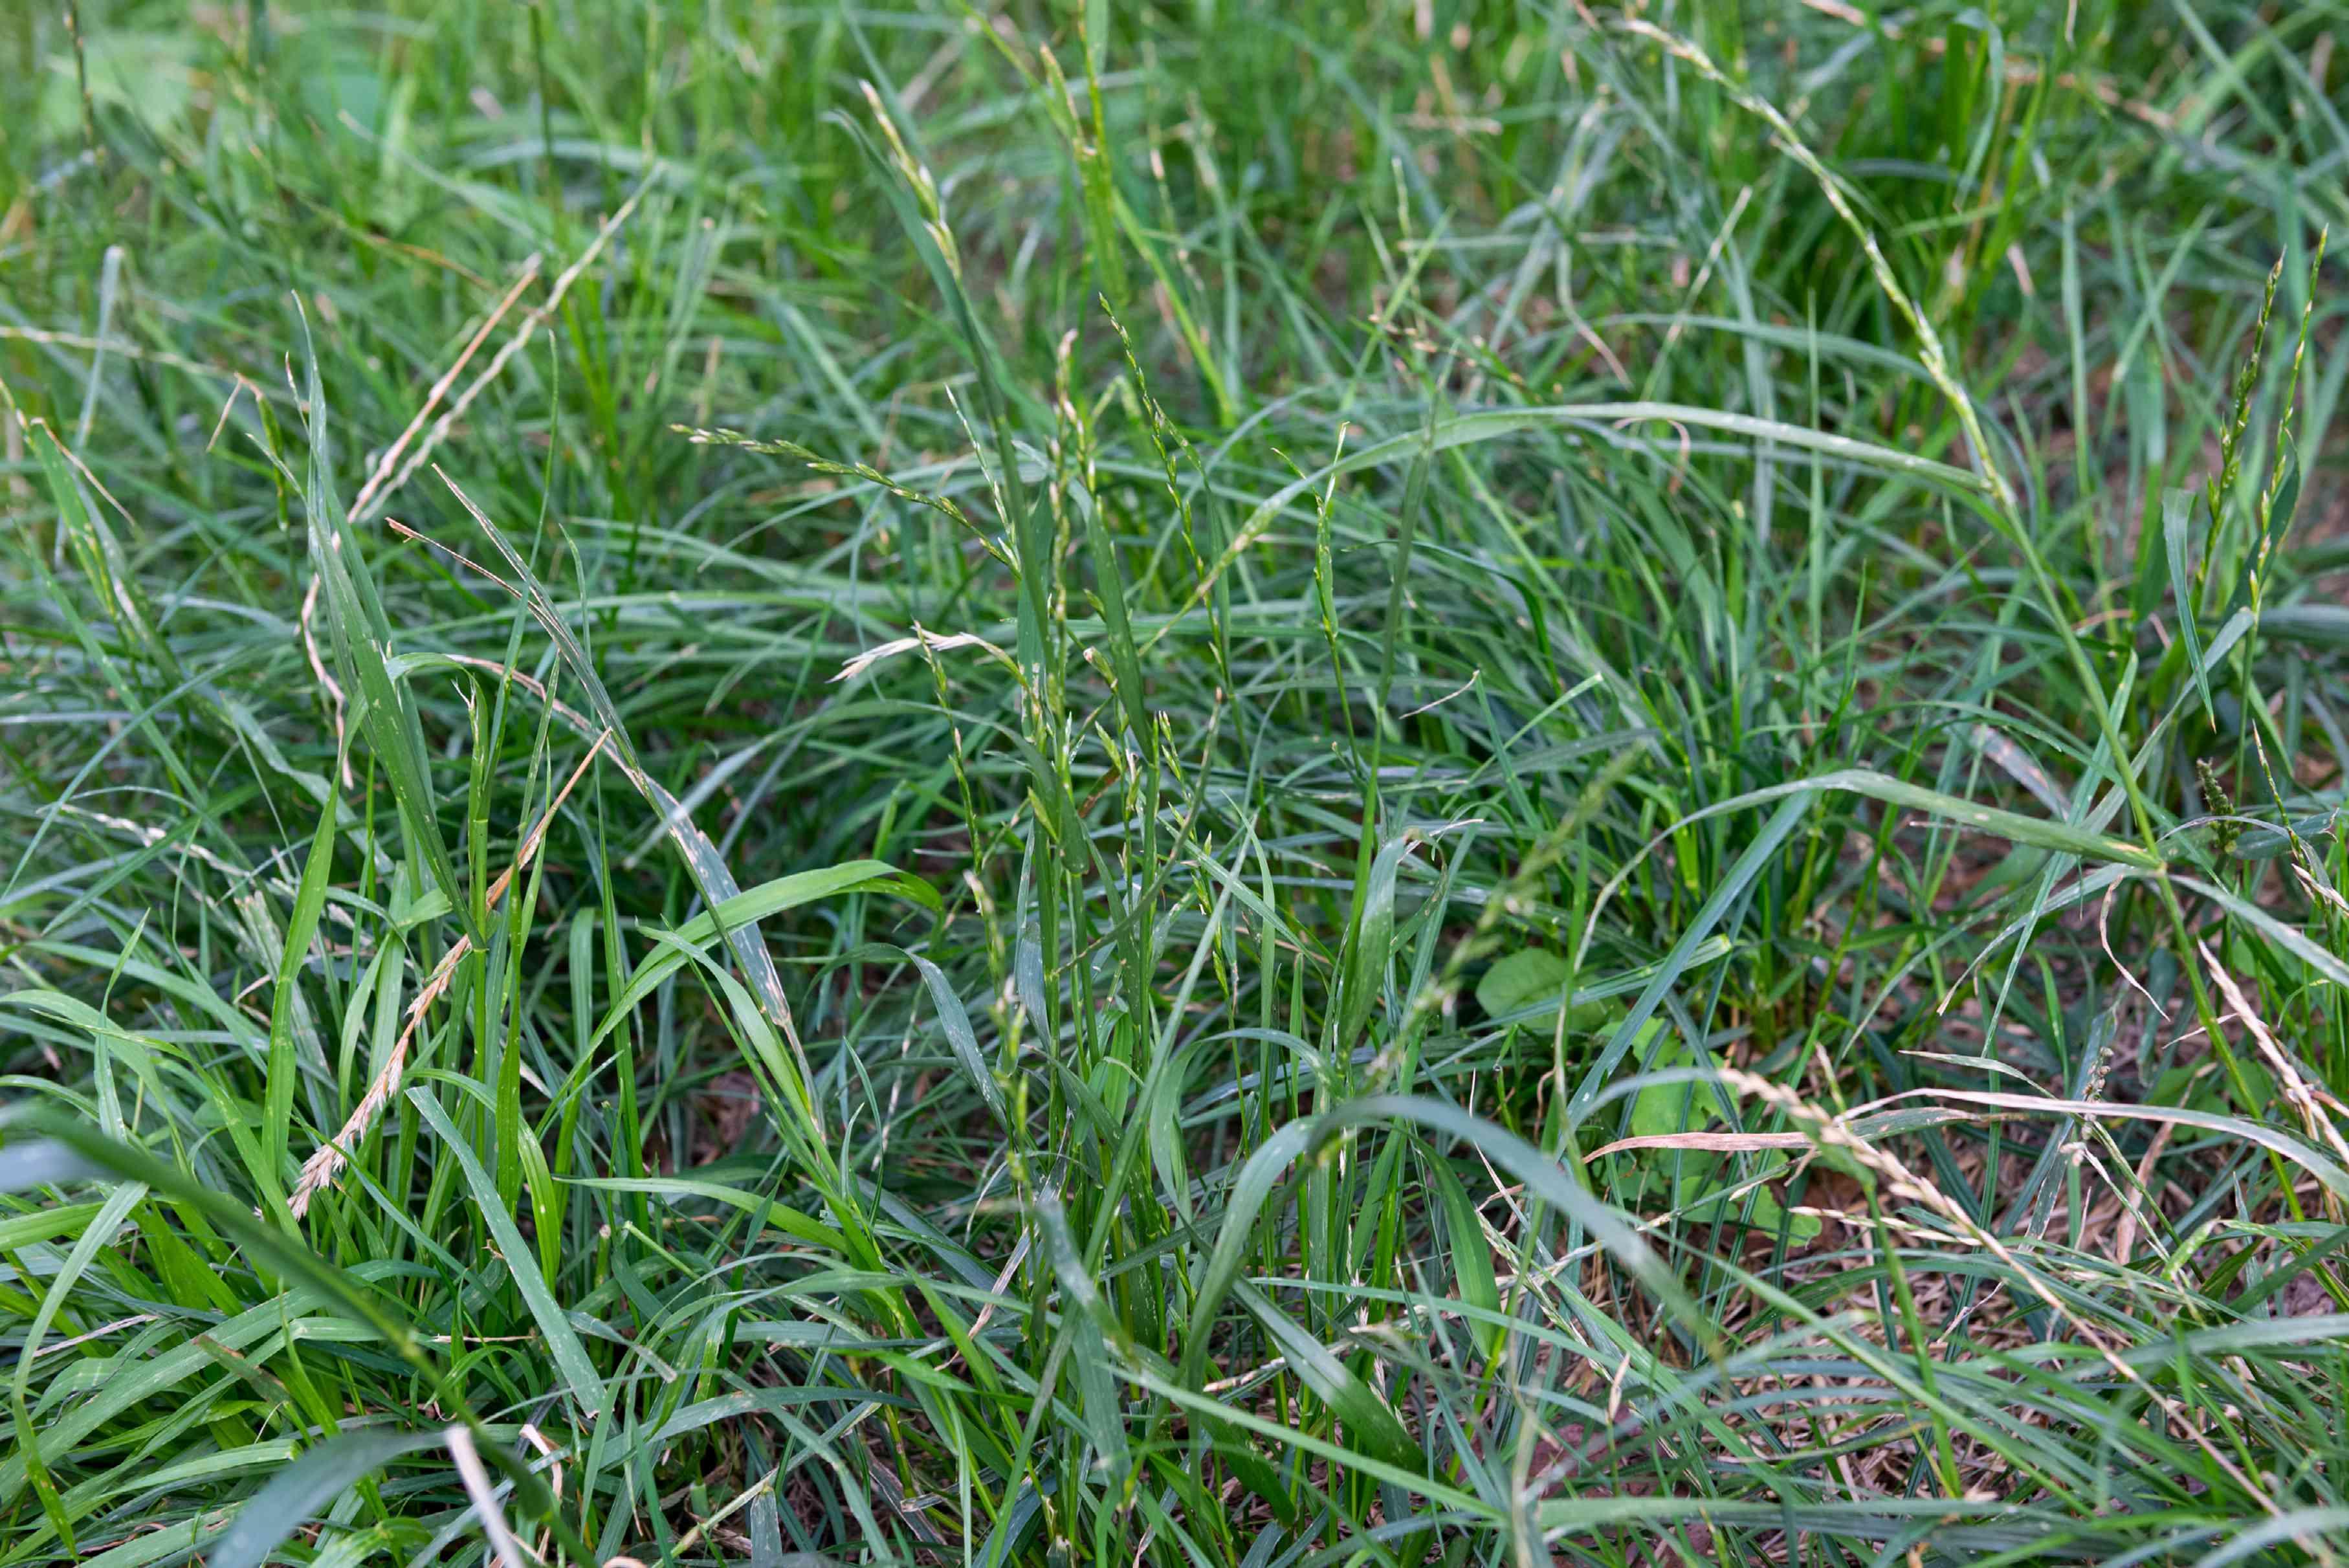 Perennial ryegrass with short green and tan grass blades